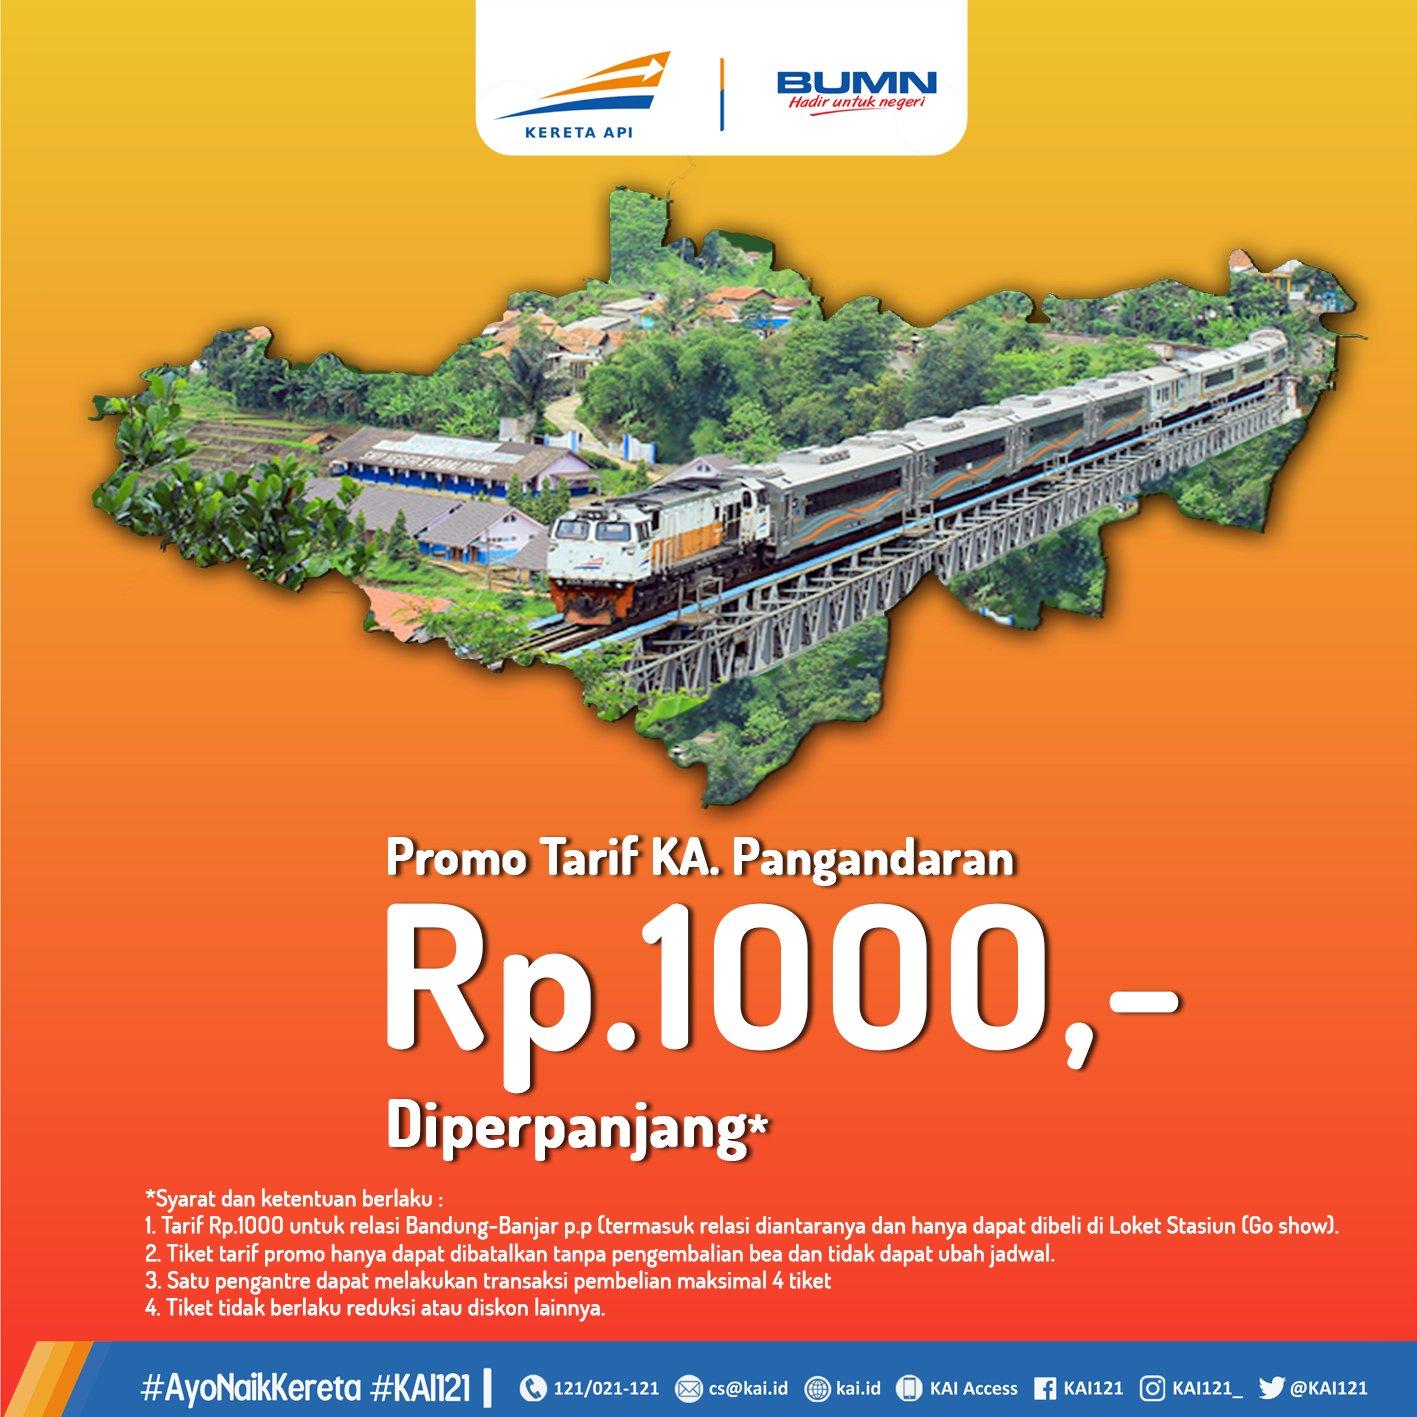 Promo Tiket Ka Pangandaran Bandung Banjar Rp 1000